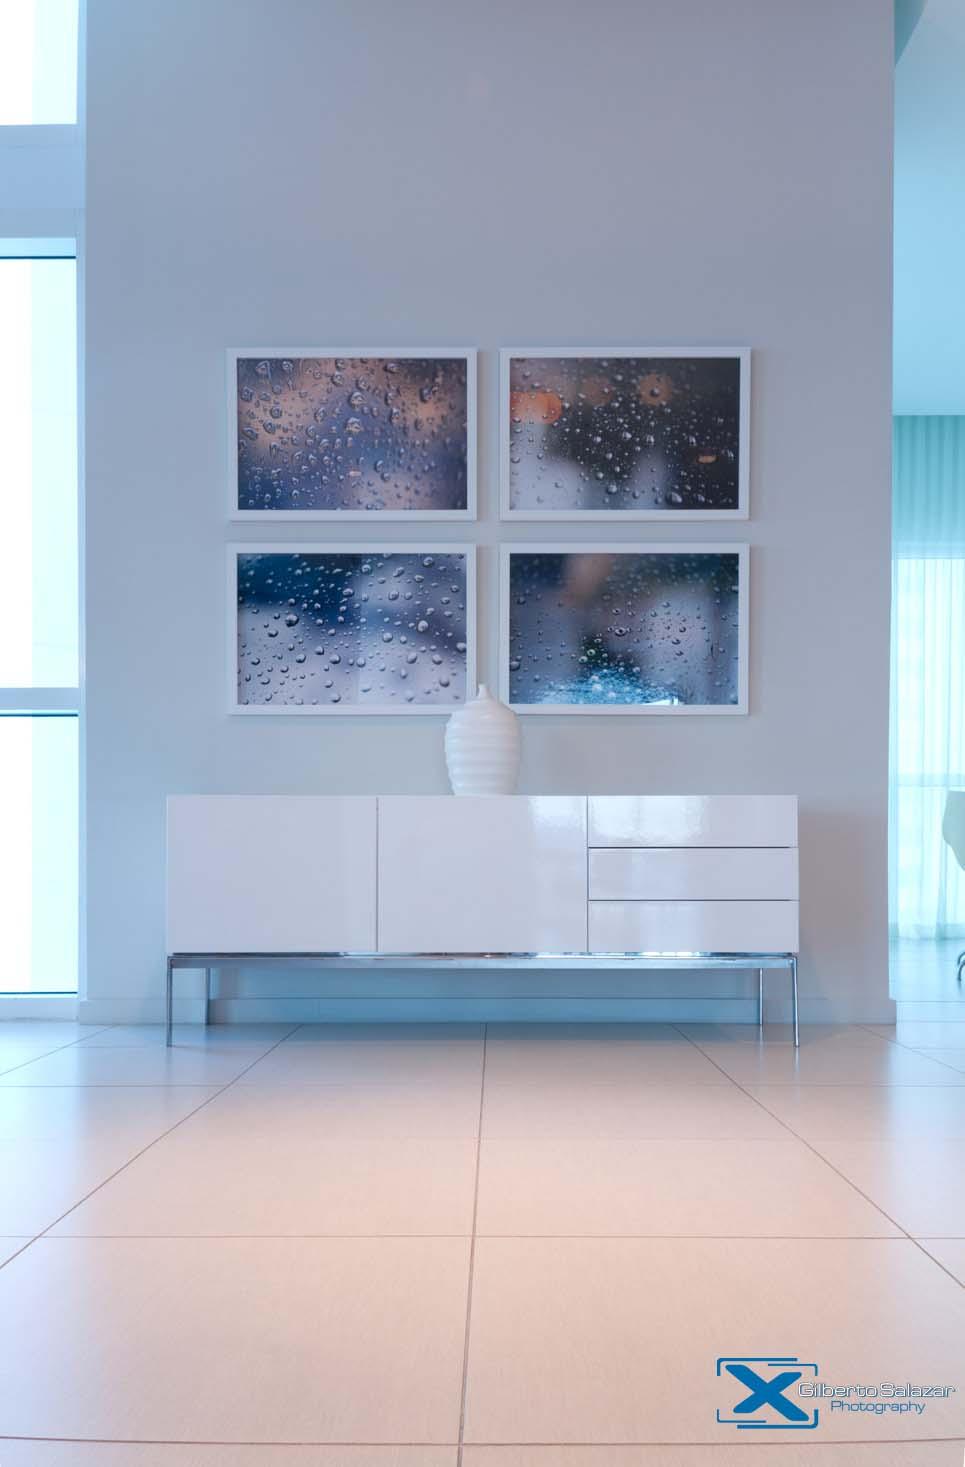 Interior Design Photo by Gilberto Salazar-7.jpg